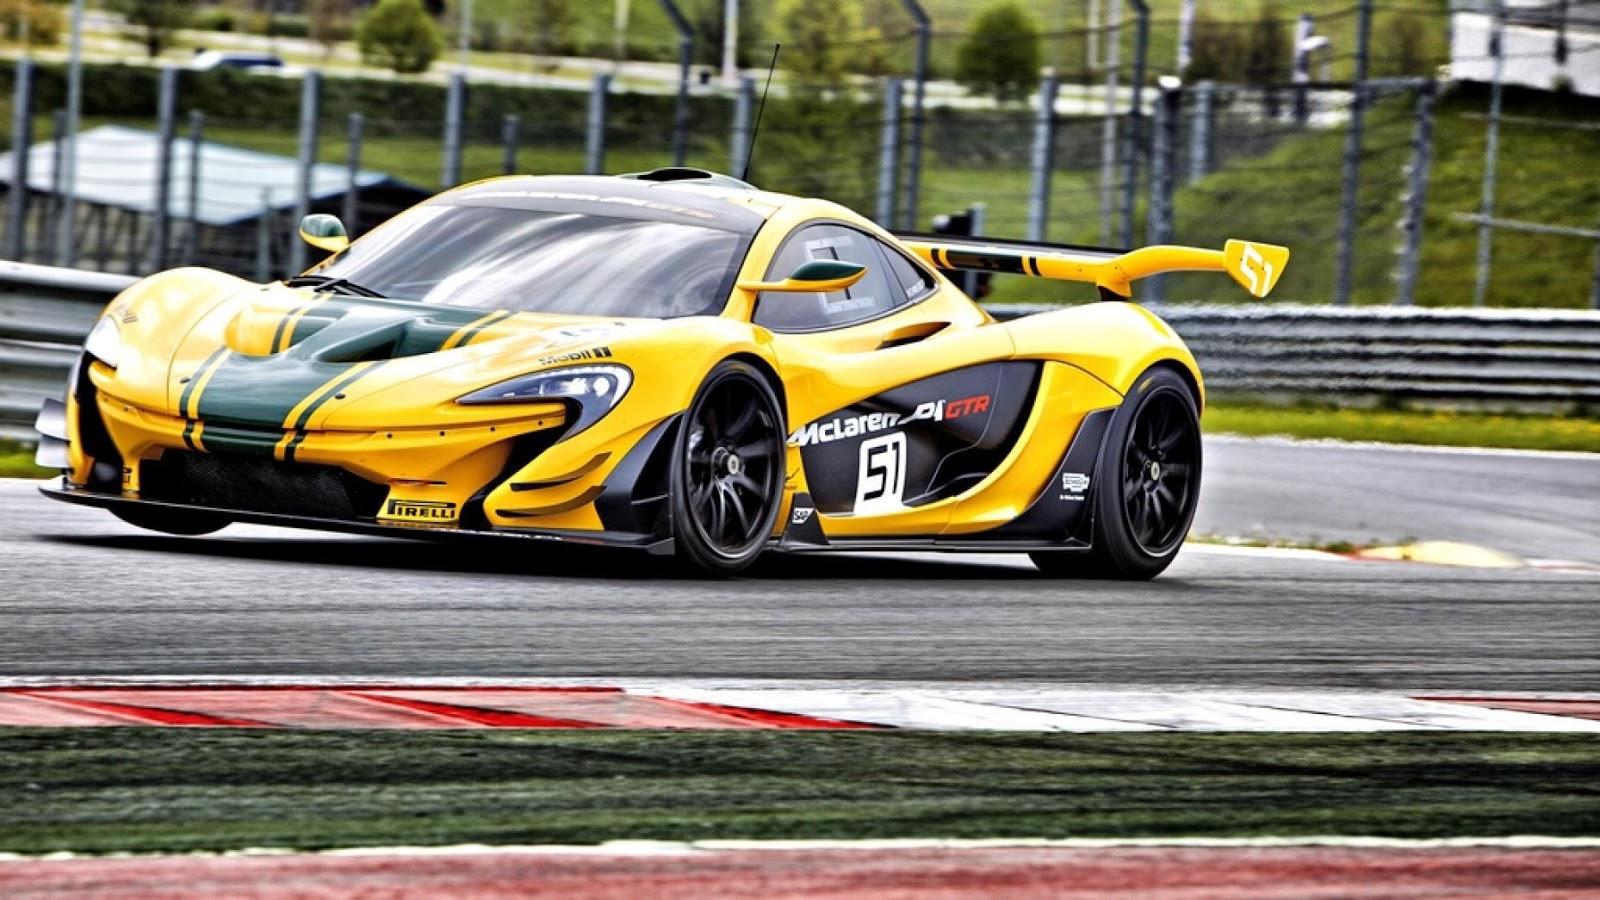 McLaren P1 GTR sức manh 985 mã lực